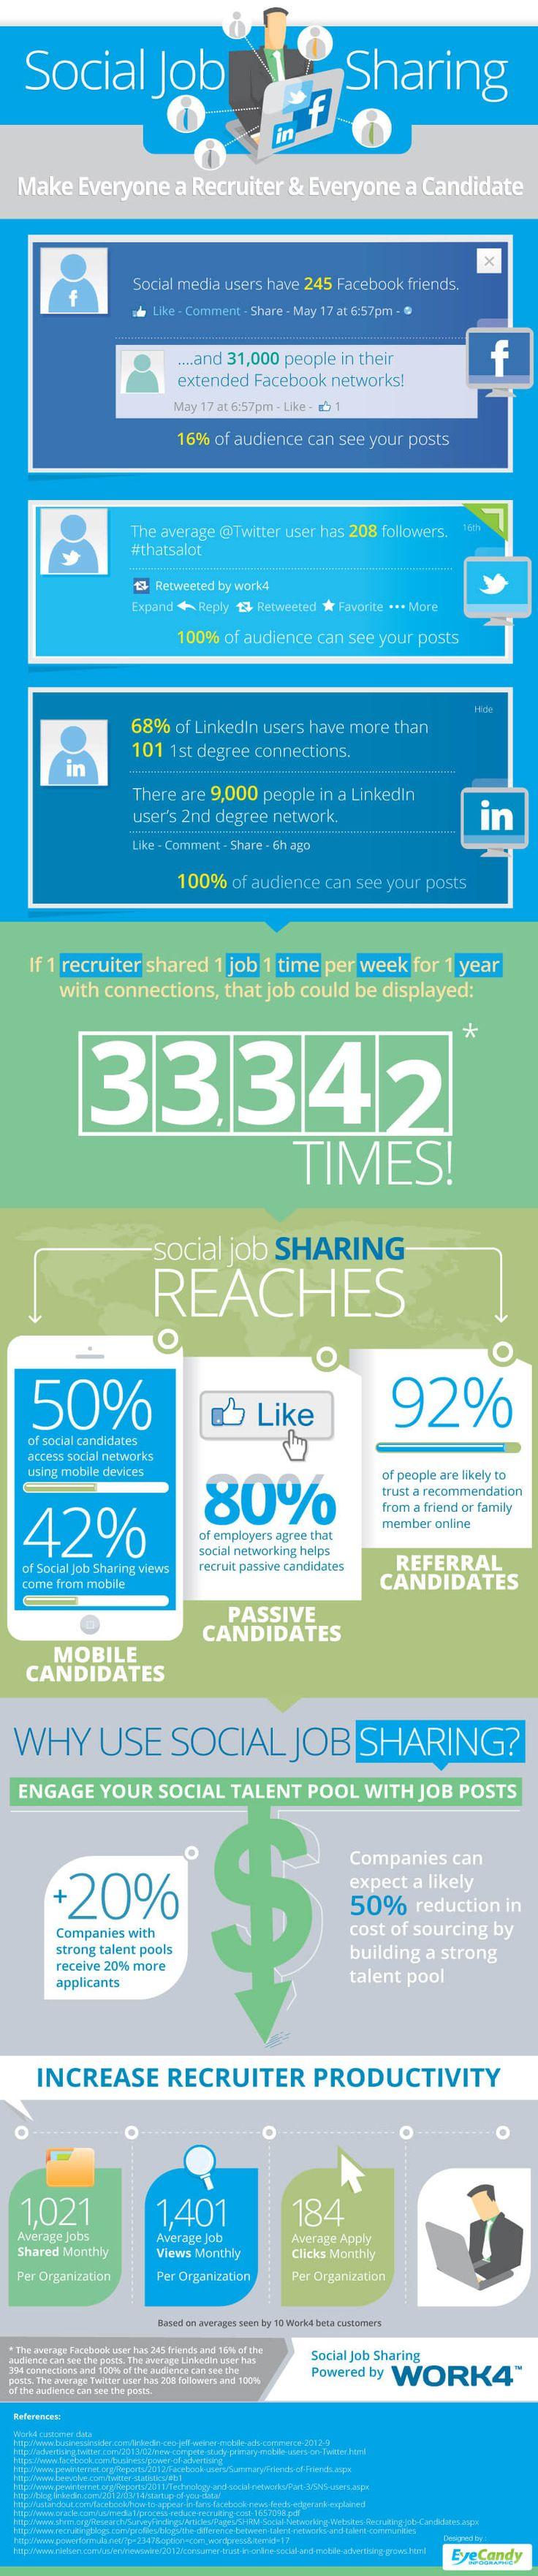 Job Posting - Social JobSharing Infographic von Work4Labs